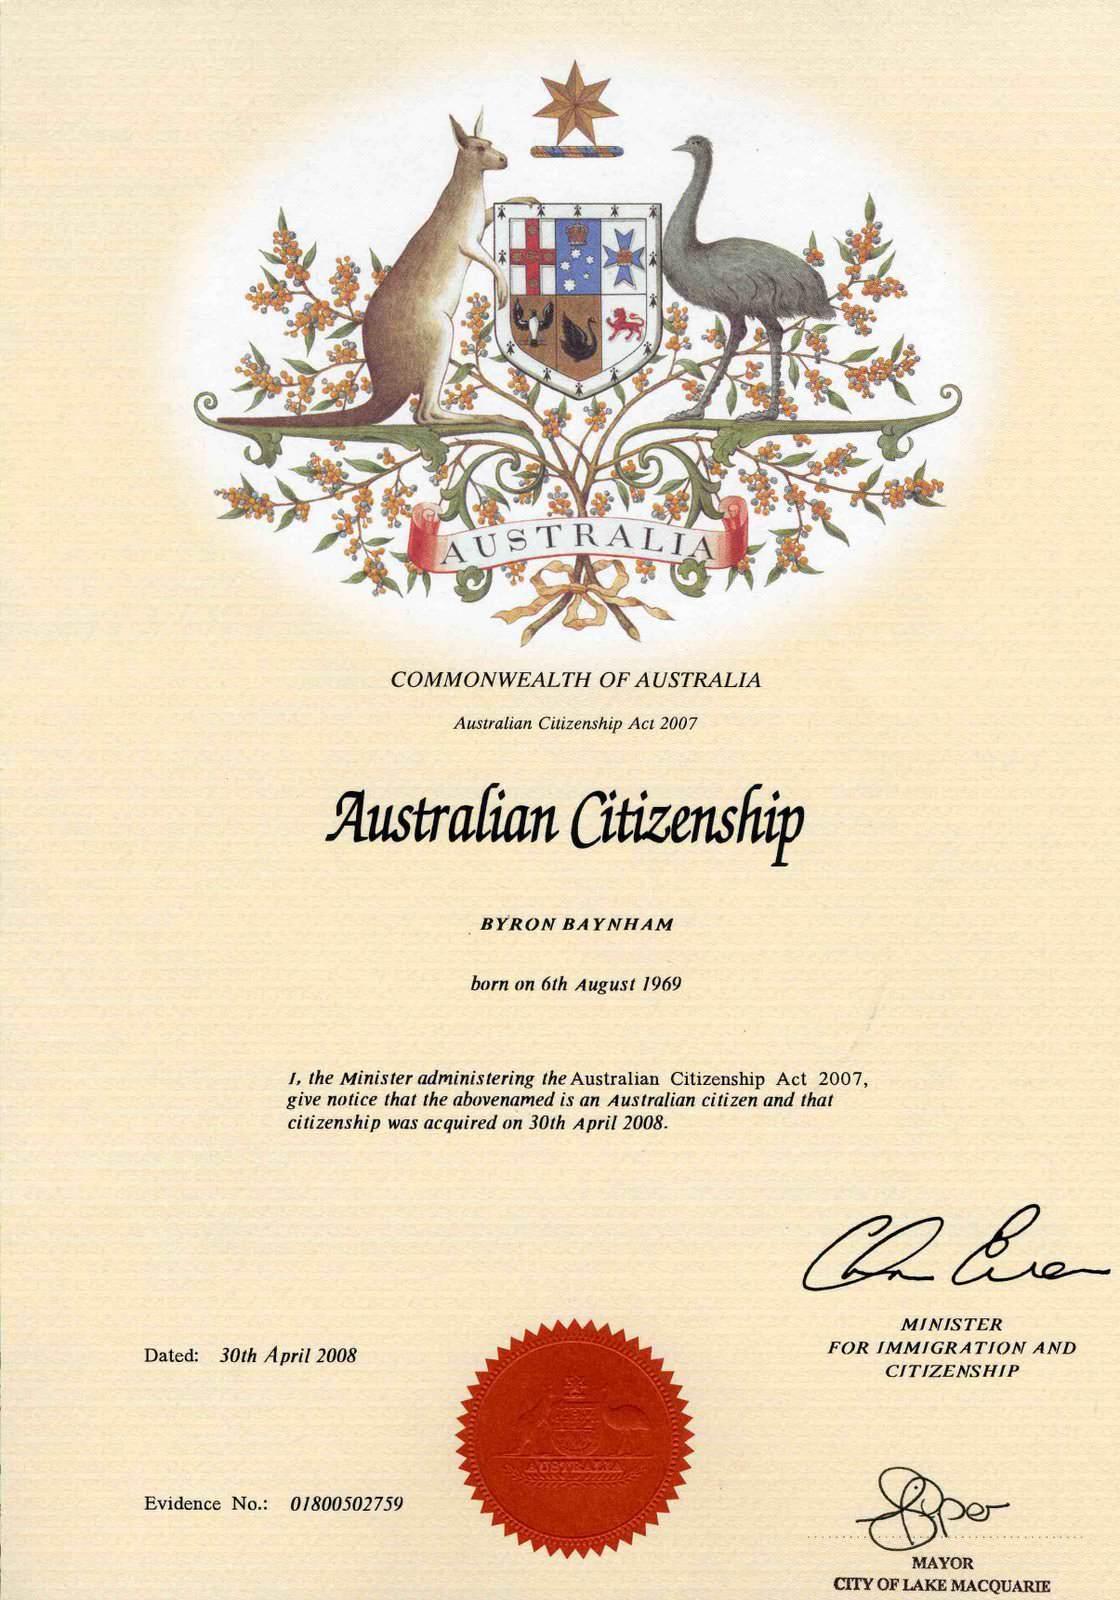 Extreme Vetting New Citizenship Test Austeralix Journals